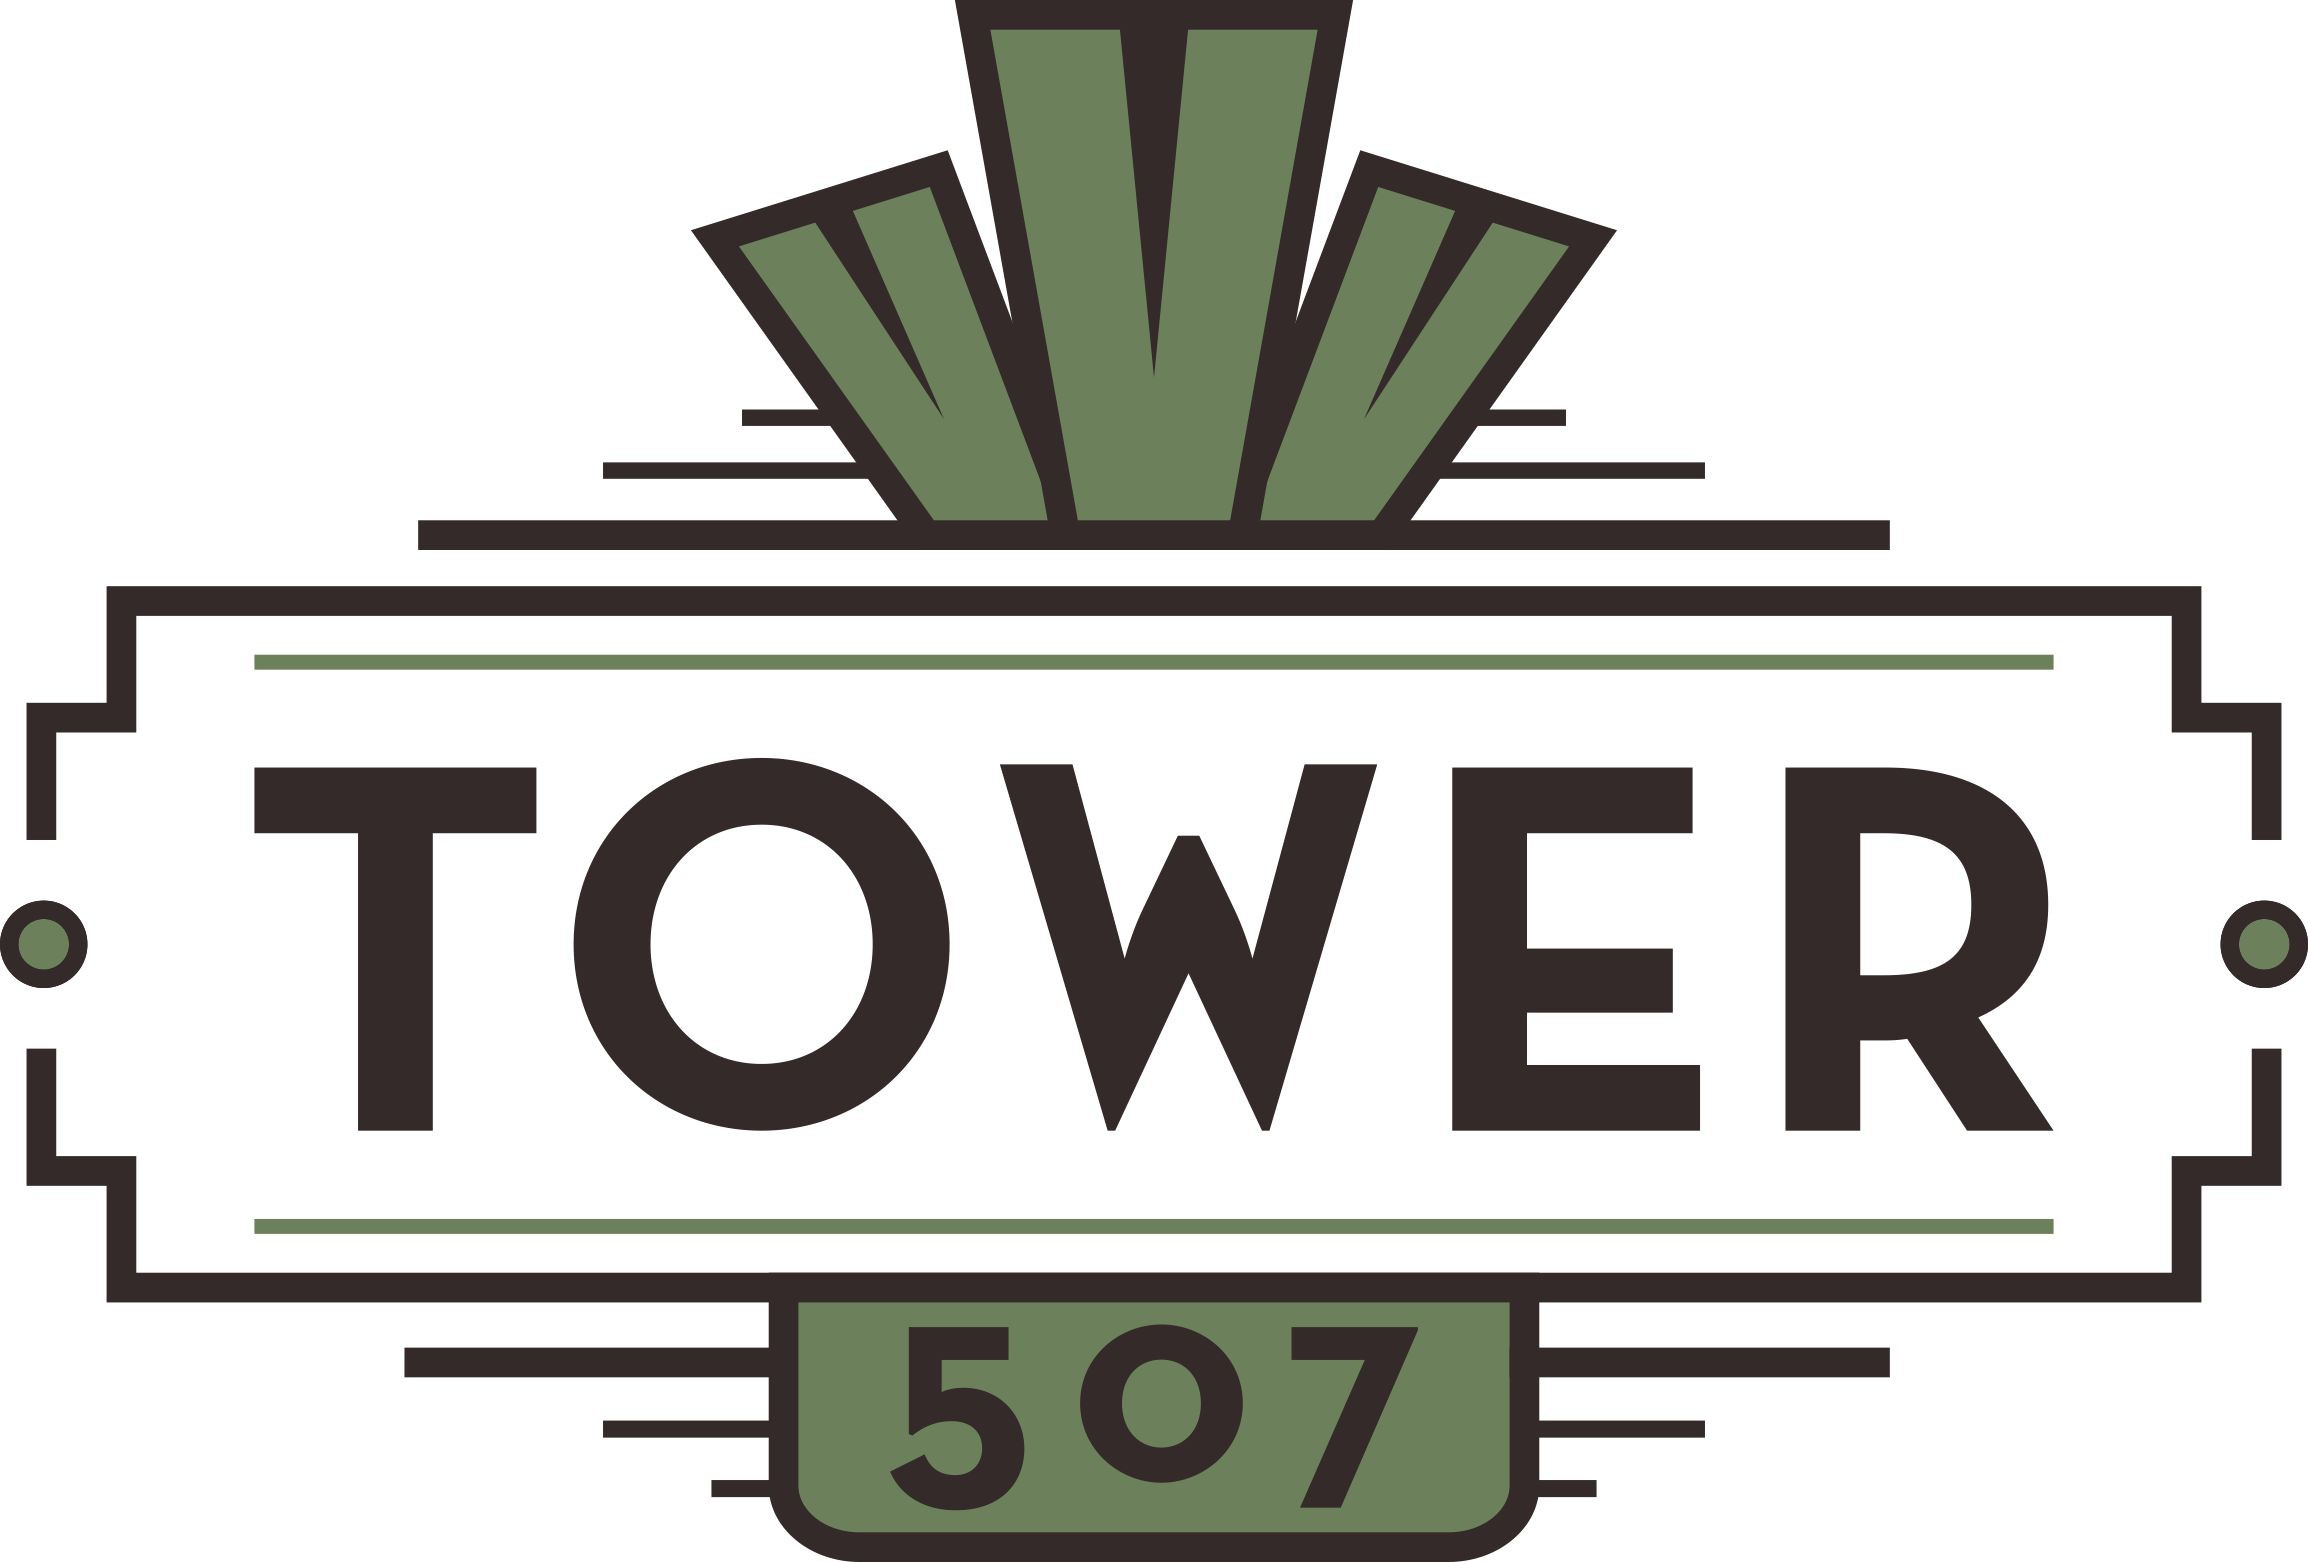 Classic 40's Hotel turned luxury apartment needs awesome logo!